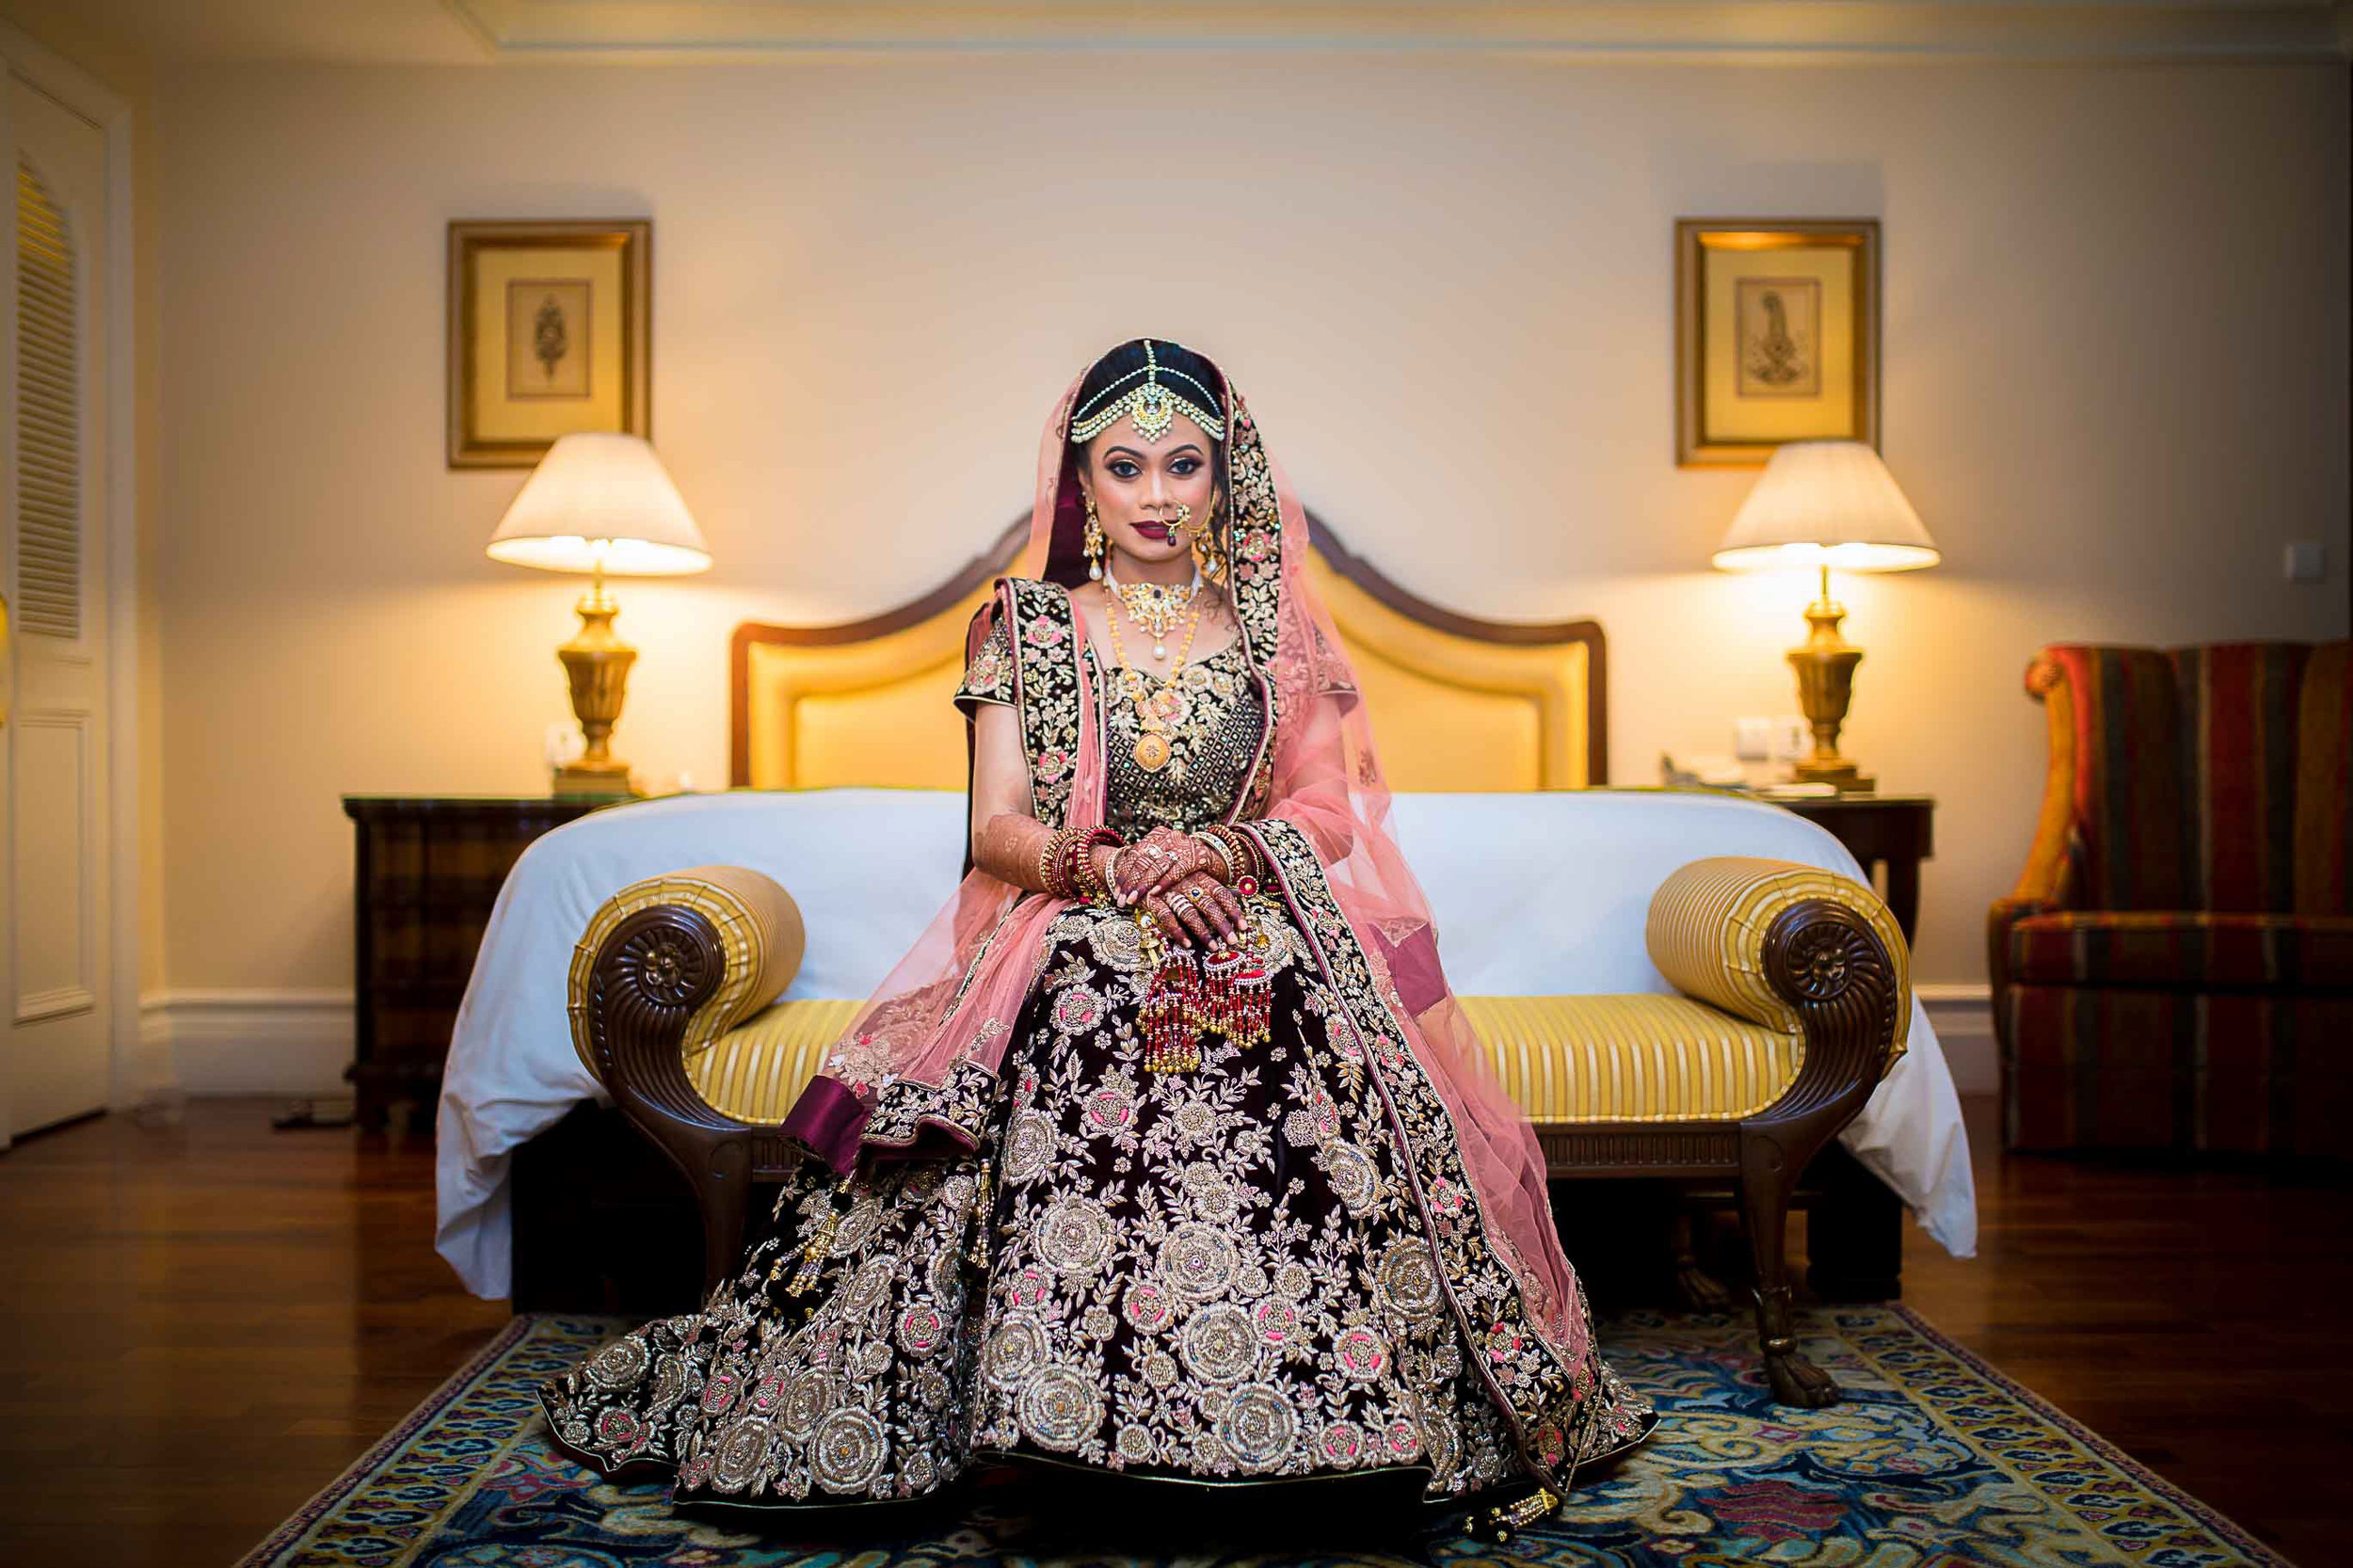 Pixel-Chronicles-Meraj-Yousuf-Candid-Wedding-Documentary-Photography-Beautiful-Bride-Best-Portrait-Muslim-Wedding-Perfect-Shot-Lela-Palace-72.jpg